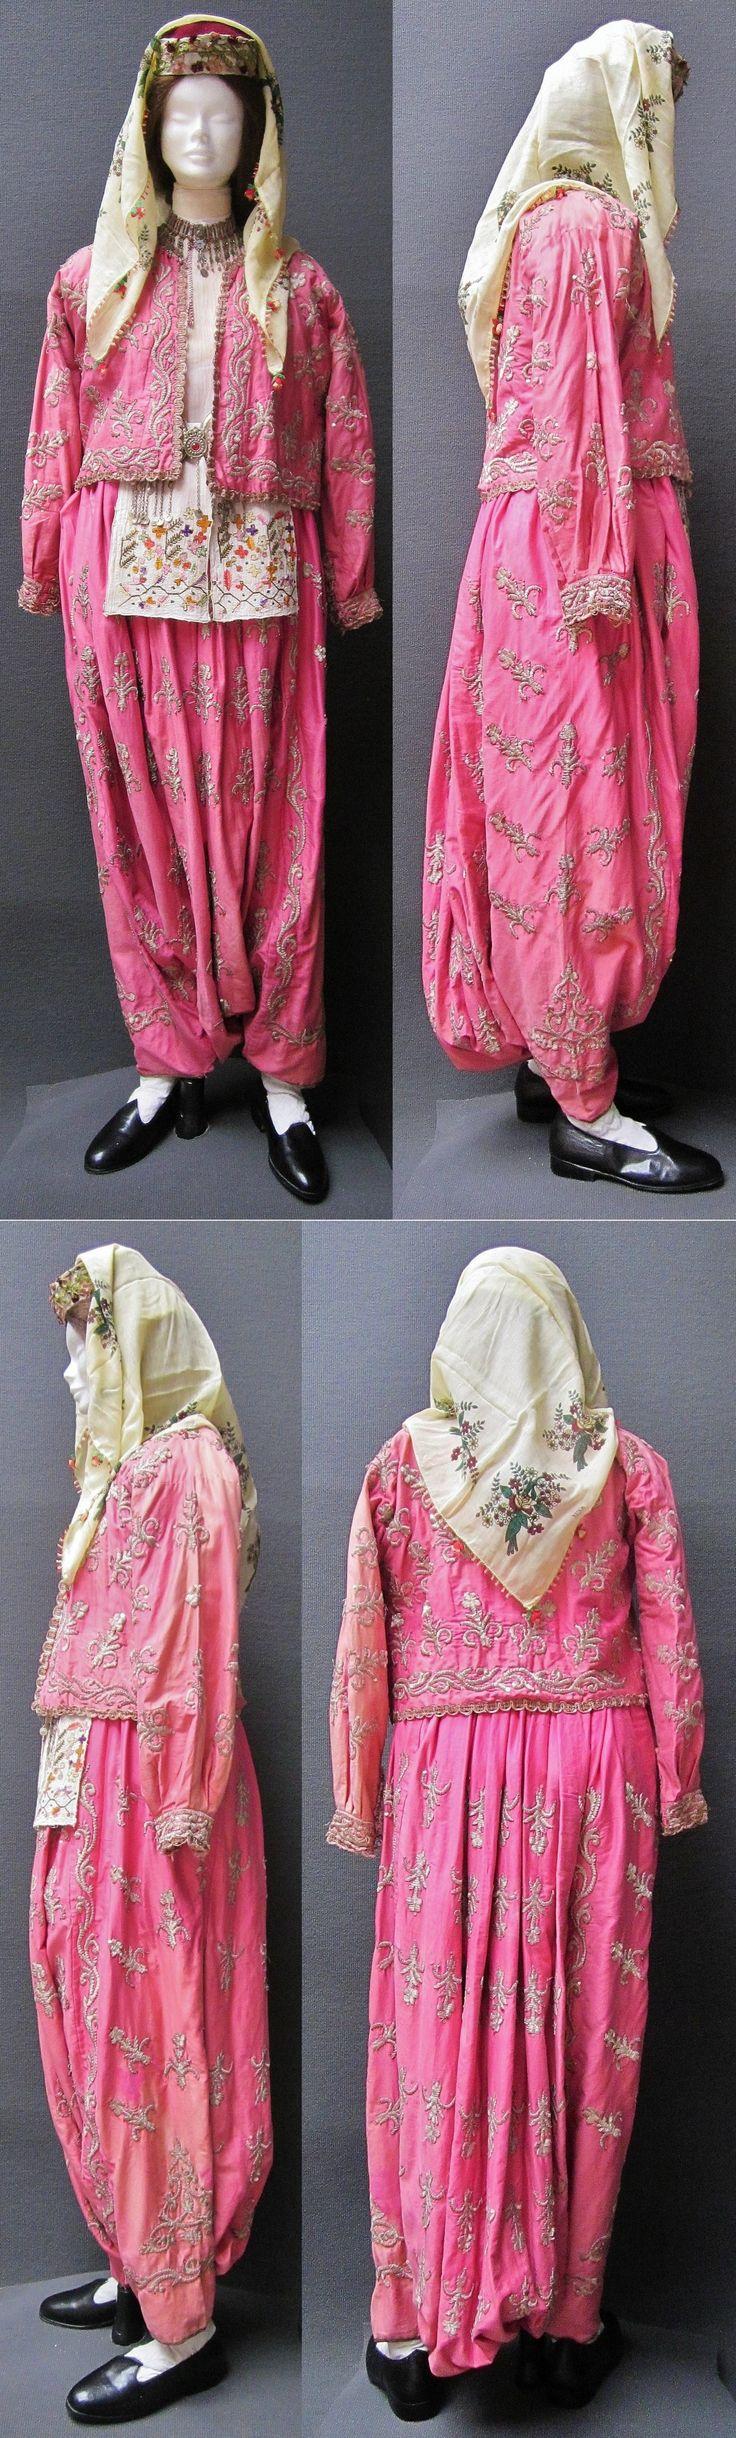 A traditional festive ensemble ('şalvar'/baggy trousers + 'cepken'/long-sleeved vest) from the Muğla region. Late-Ottoman, urban style, circa 1925-1950. Adorned with goldwork embroidery (in 'Maraş işi'-technique) on silk. (Kavak Costume Collection - Antwerpen/Belgium).